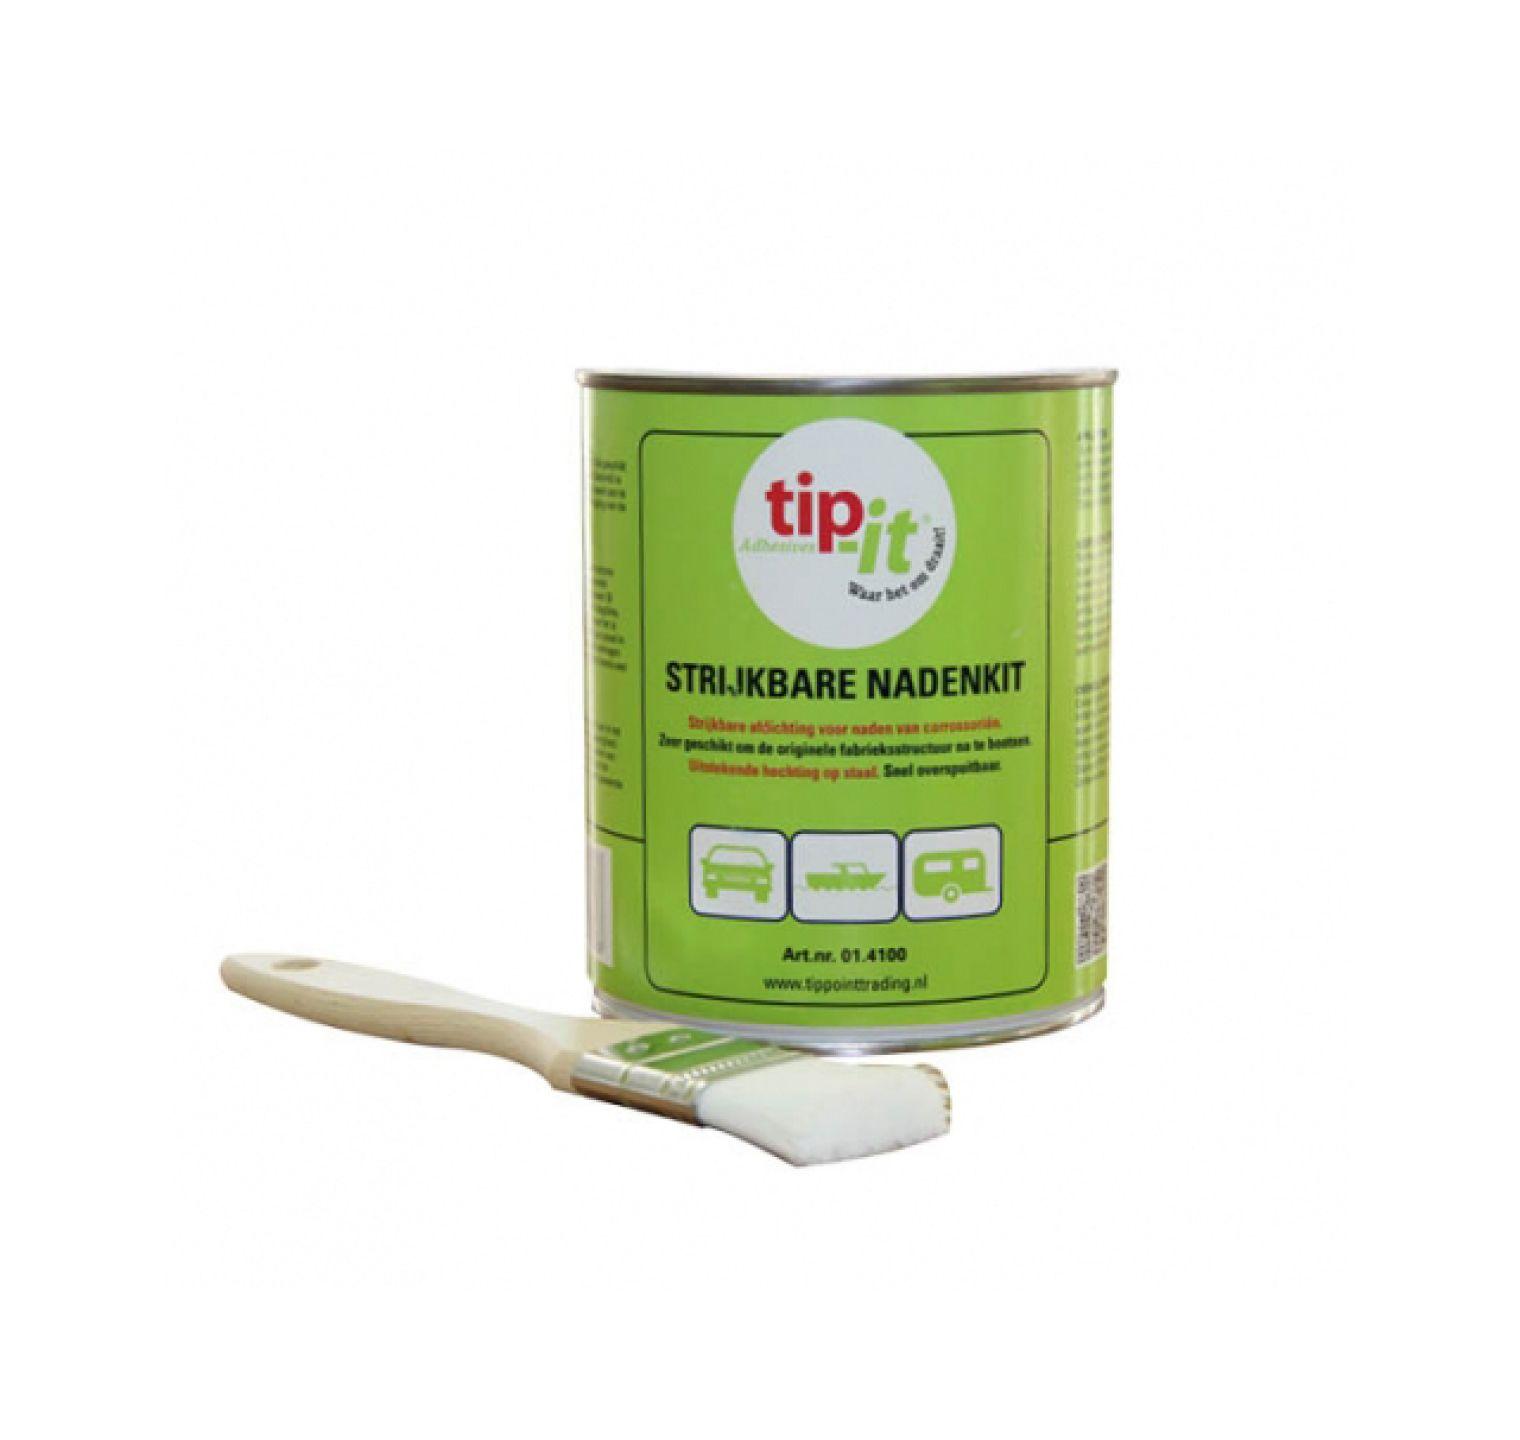 Tip-it Strijkbare Nadenkit 1l+kwast